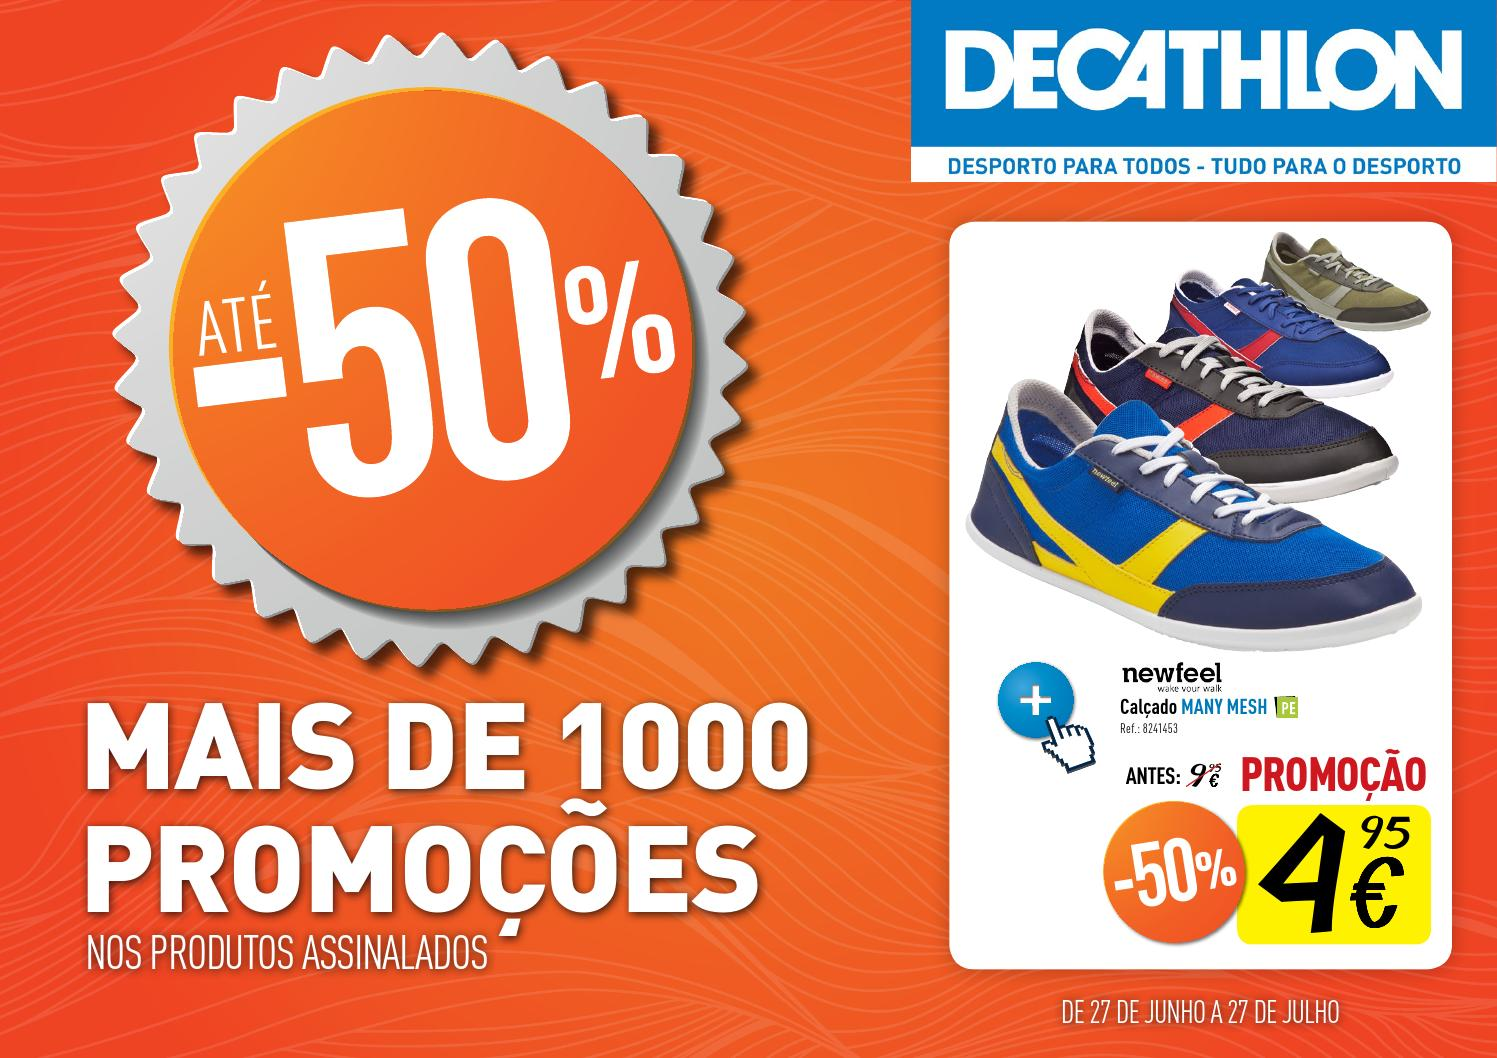 06b240de8 Folheto decathlon promoções by Decathlon Portugal - issuu